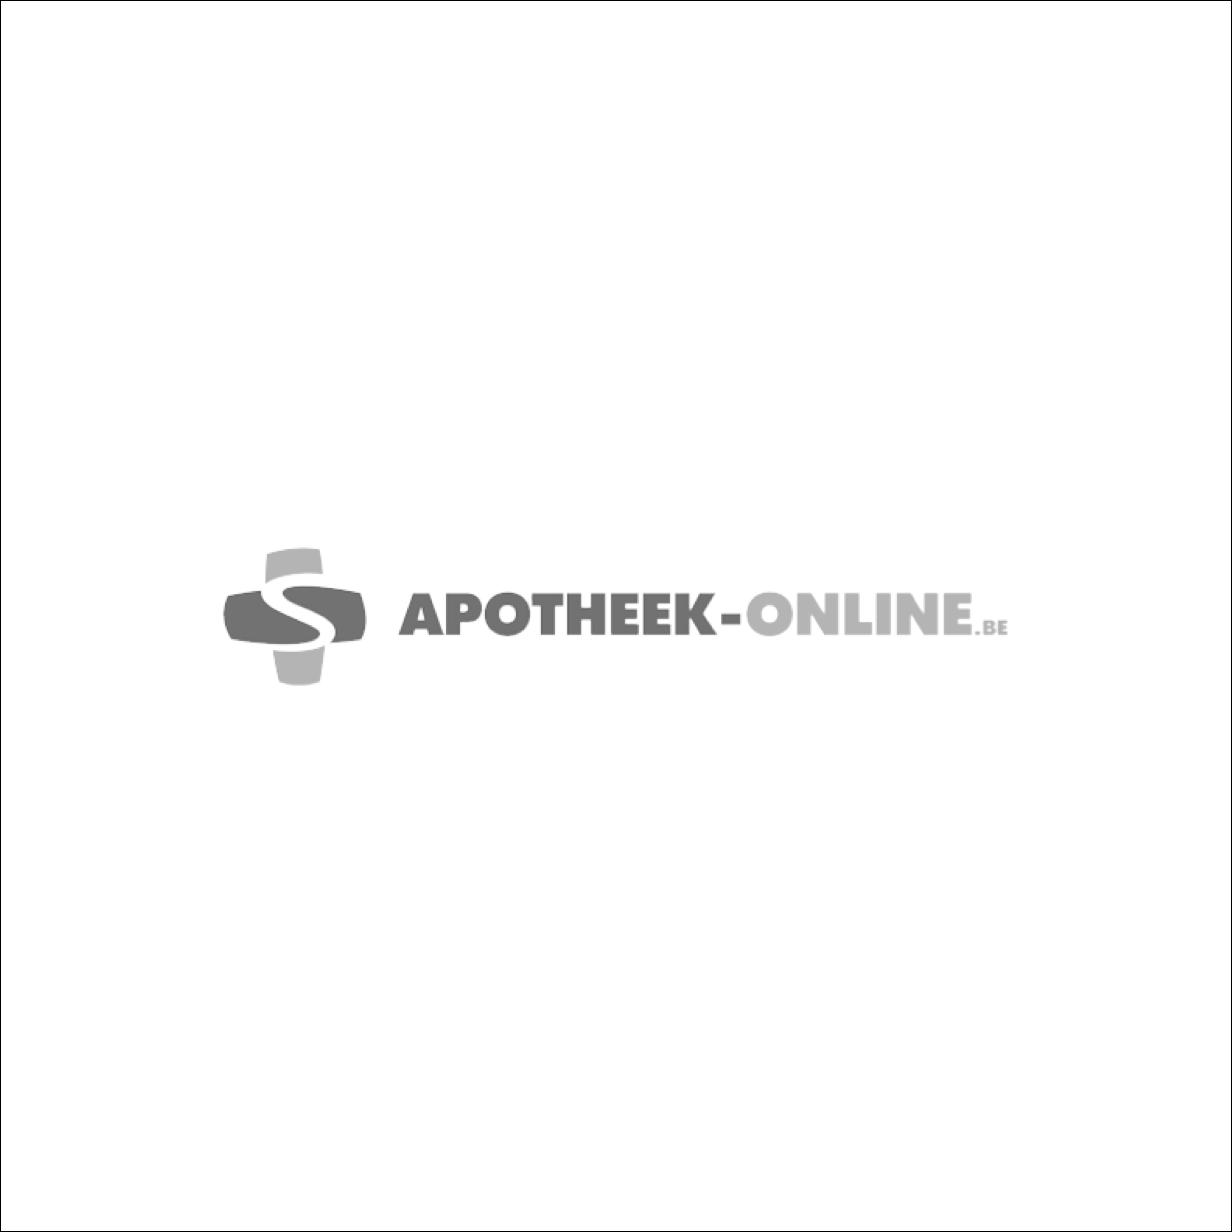 Hyabak 015 Duopack Nf Fl 2x10ml Rempl 2879617